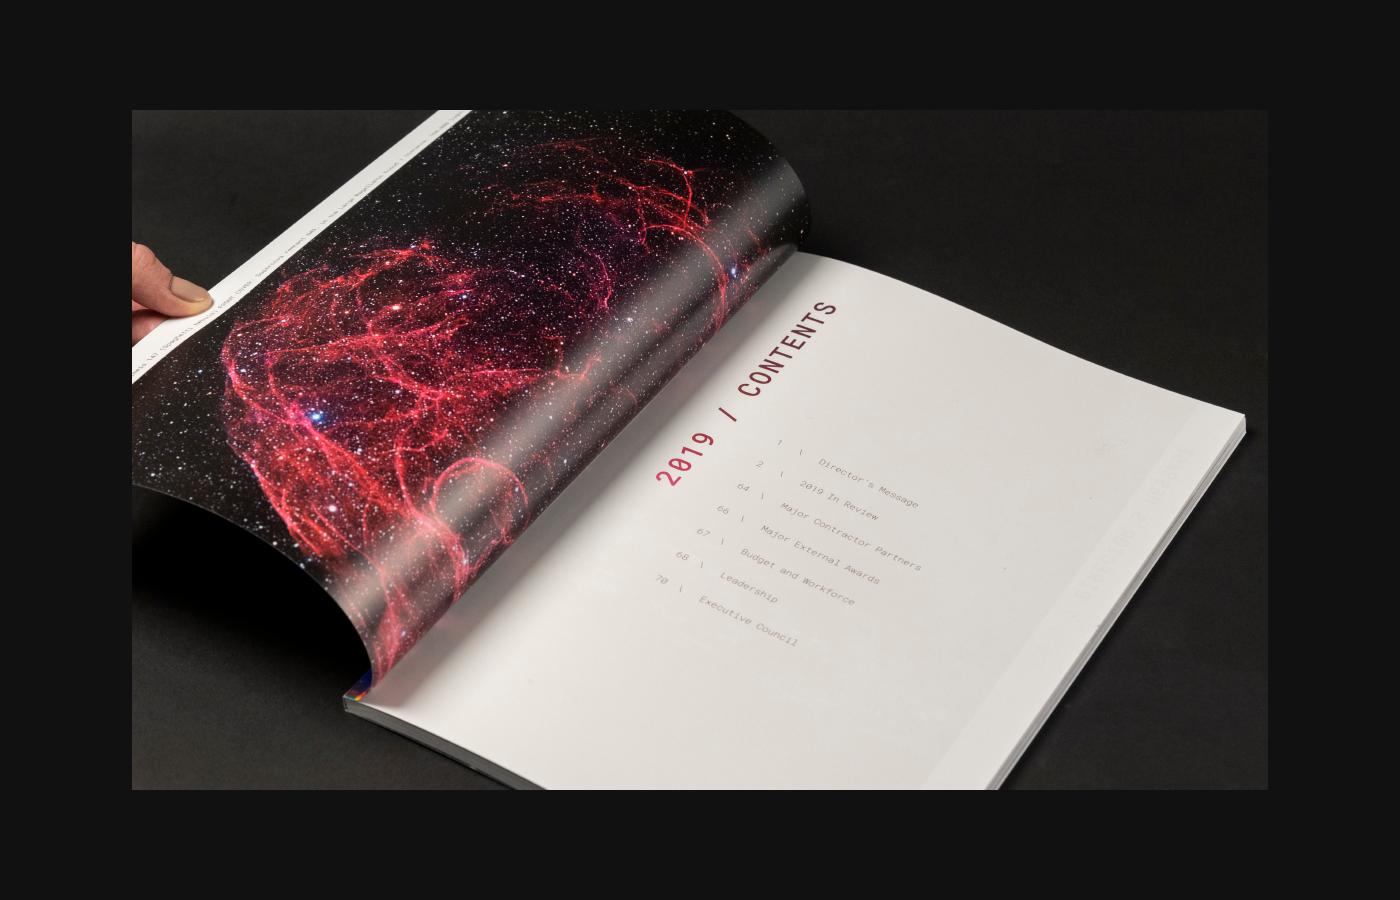 annual report Designlab holograph holographic JPL JPL-Designlab nasa